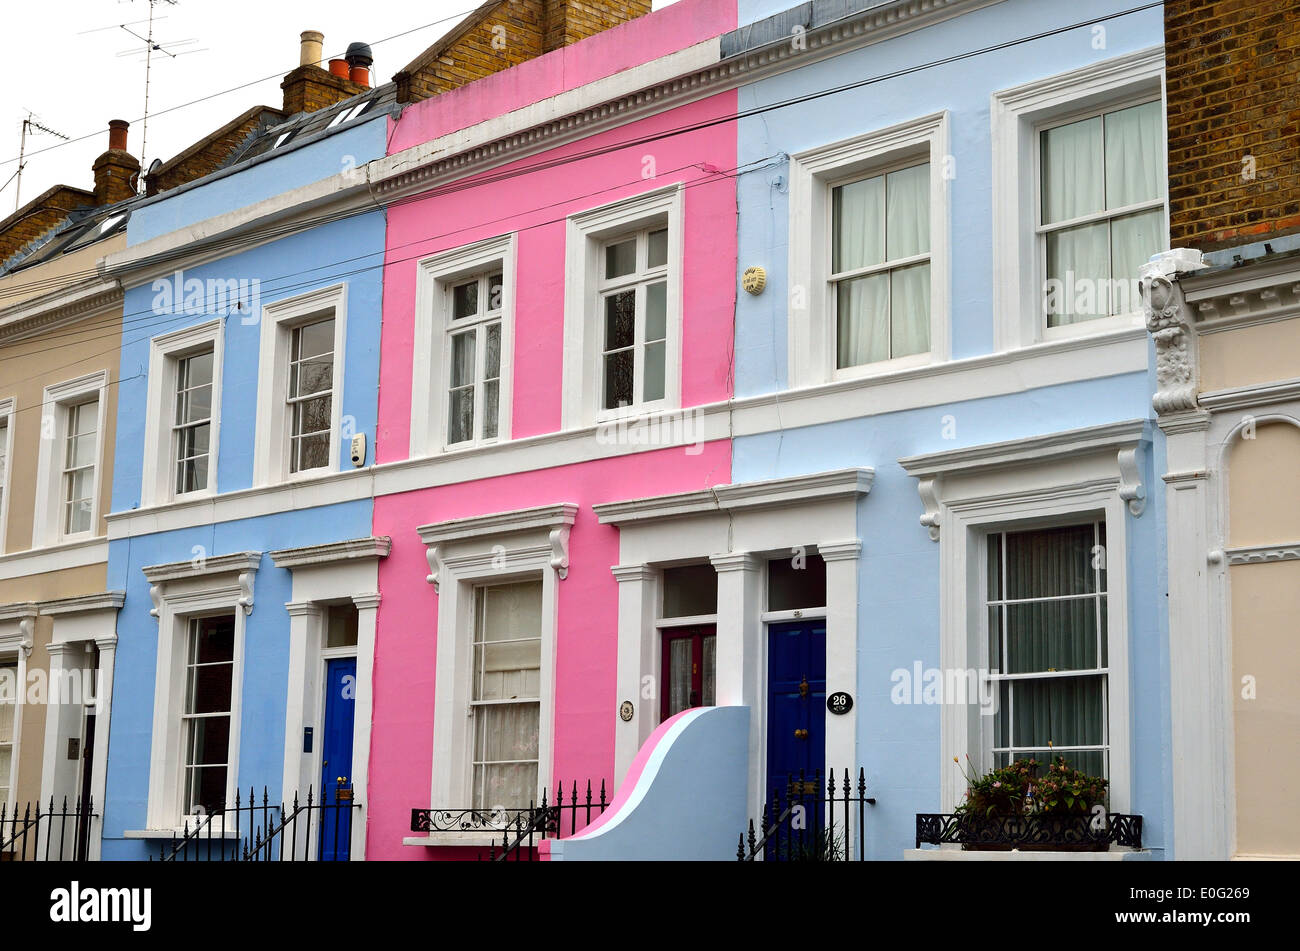 Colourful Houses Chelsea London Stock Photos & Colourful Houses ...